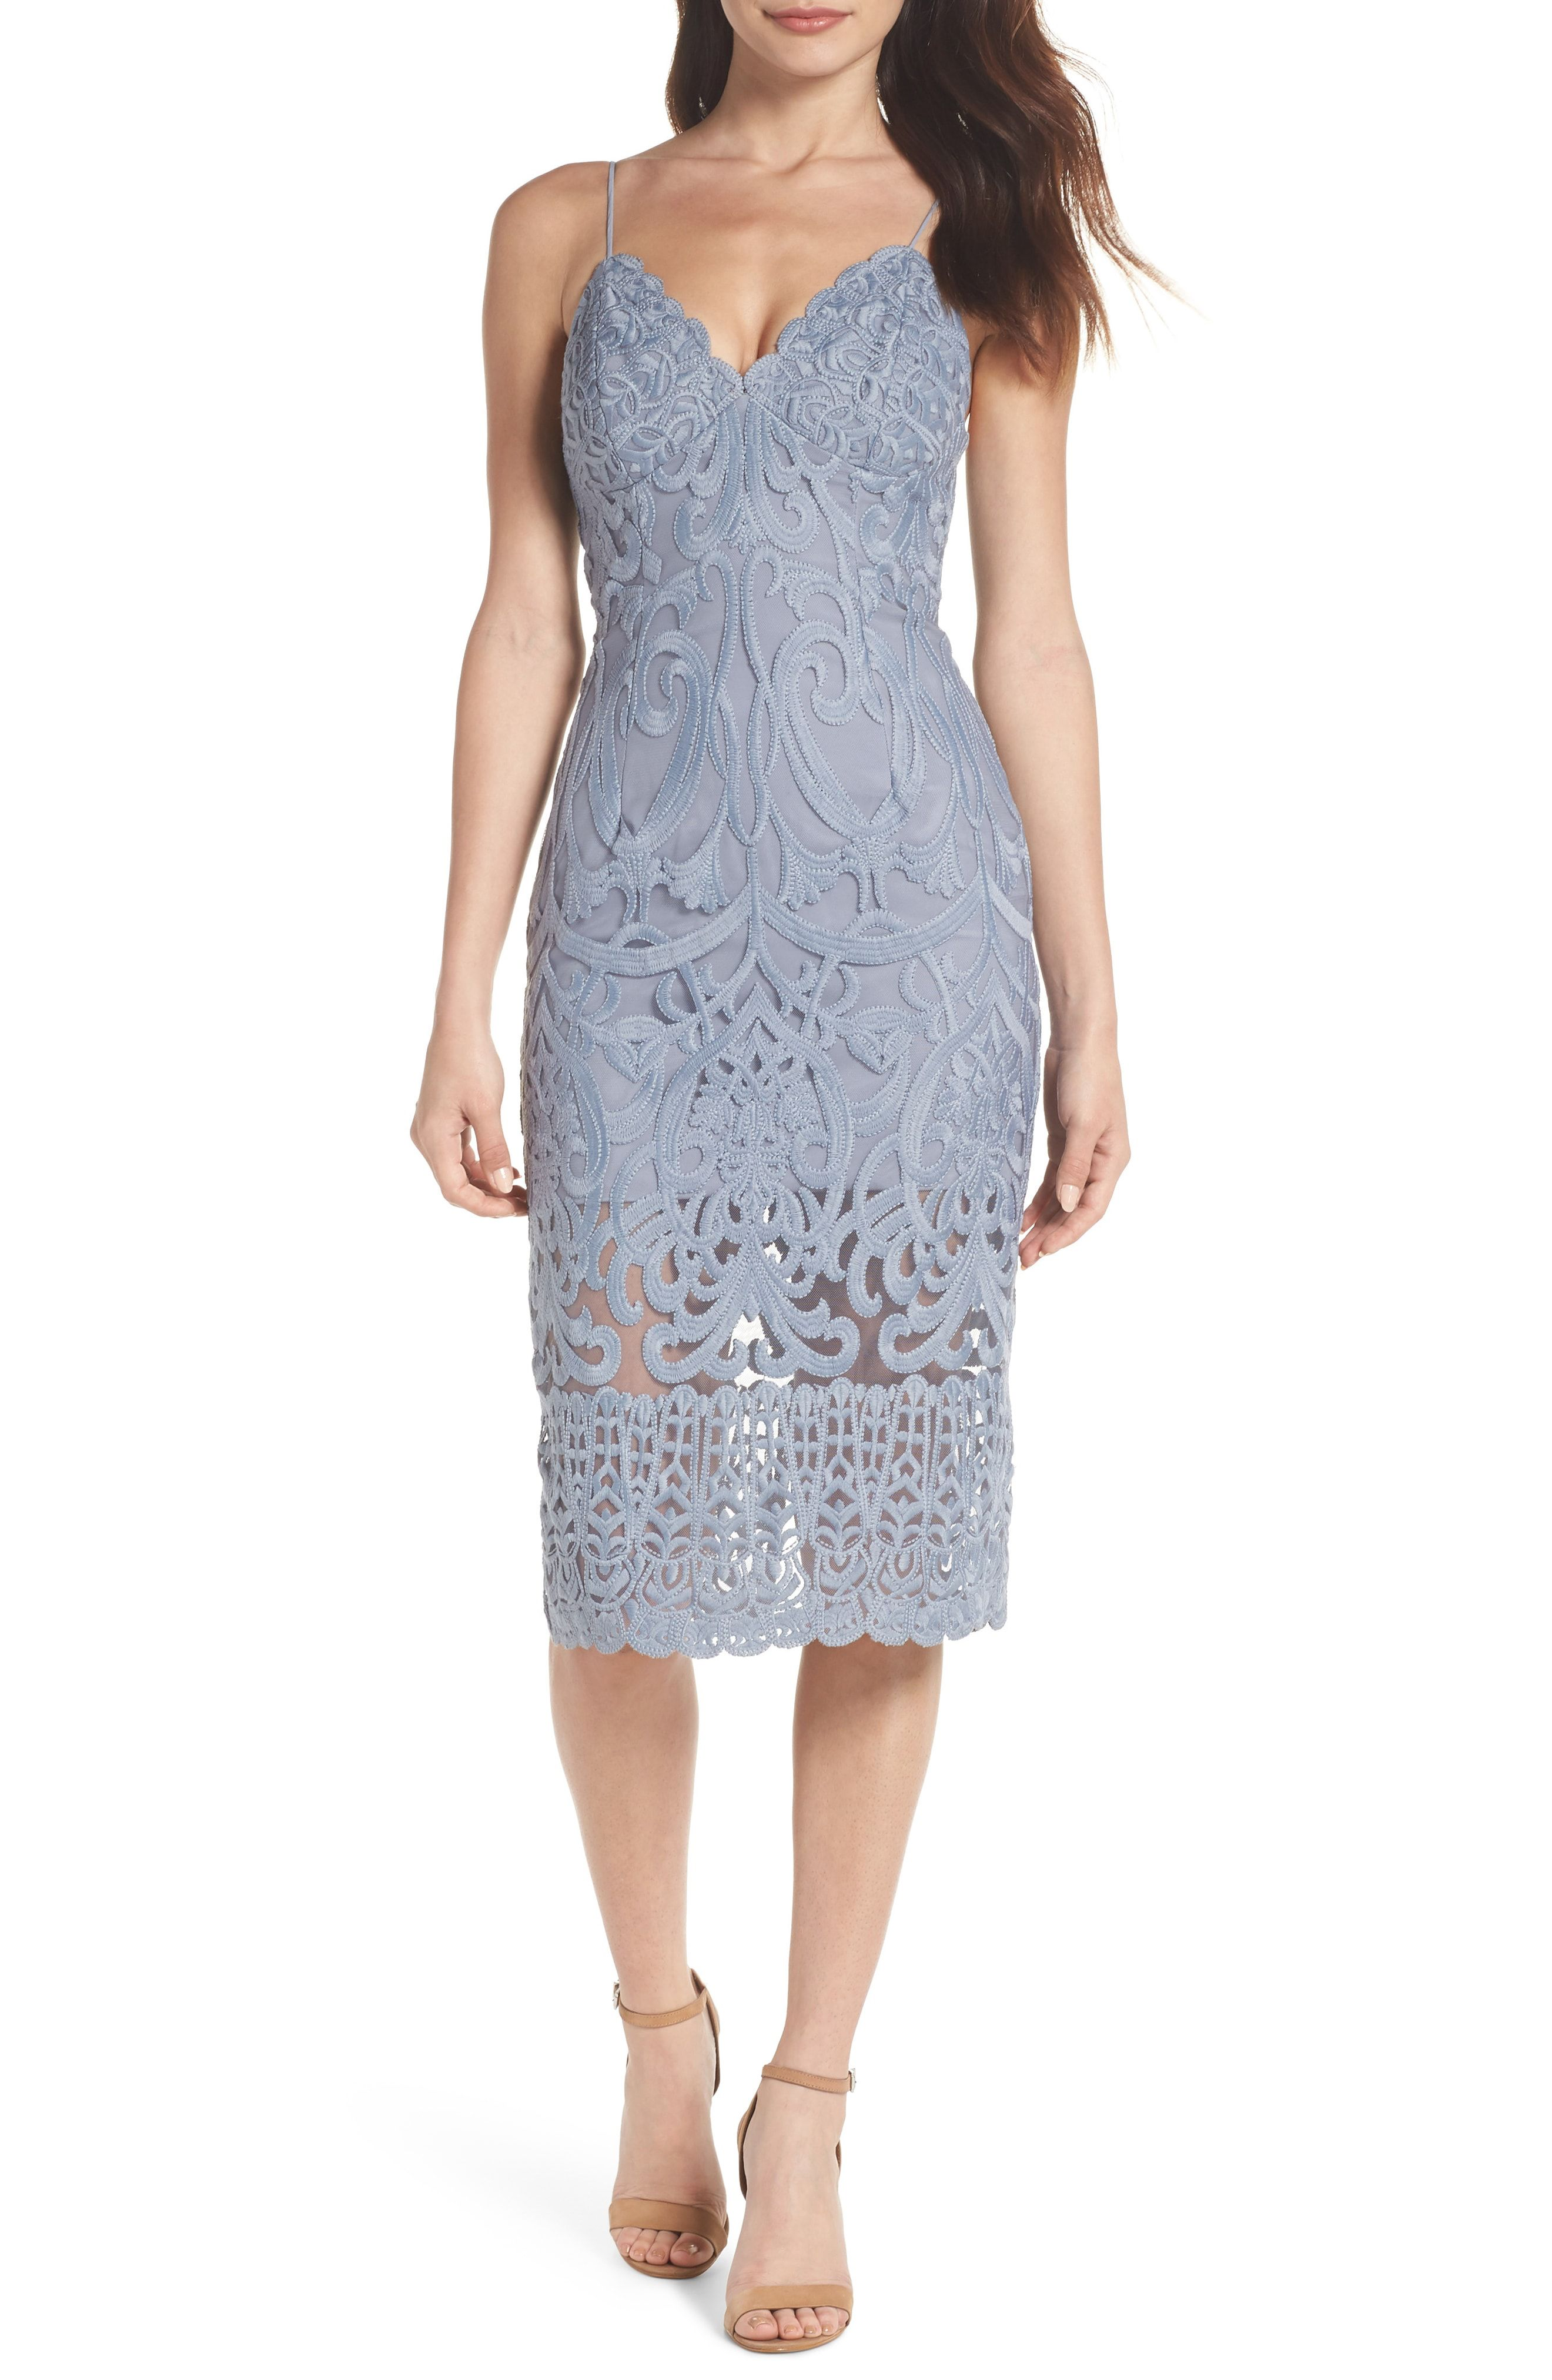 Bardot Gia Lace Pencil Dress Available At Nordstrom Mesh Cocktail Dress Dresses Trendy Cocktail Dresses [ 4048 x 2640 Pixel ]